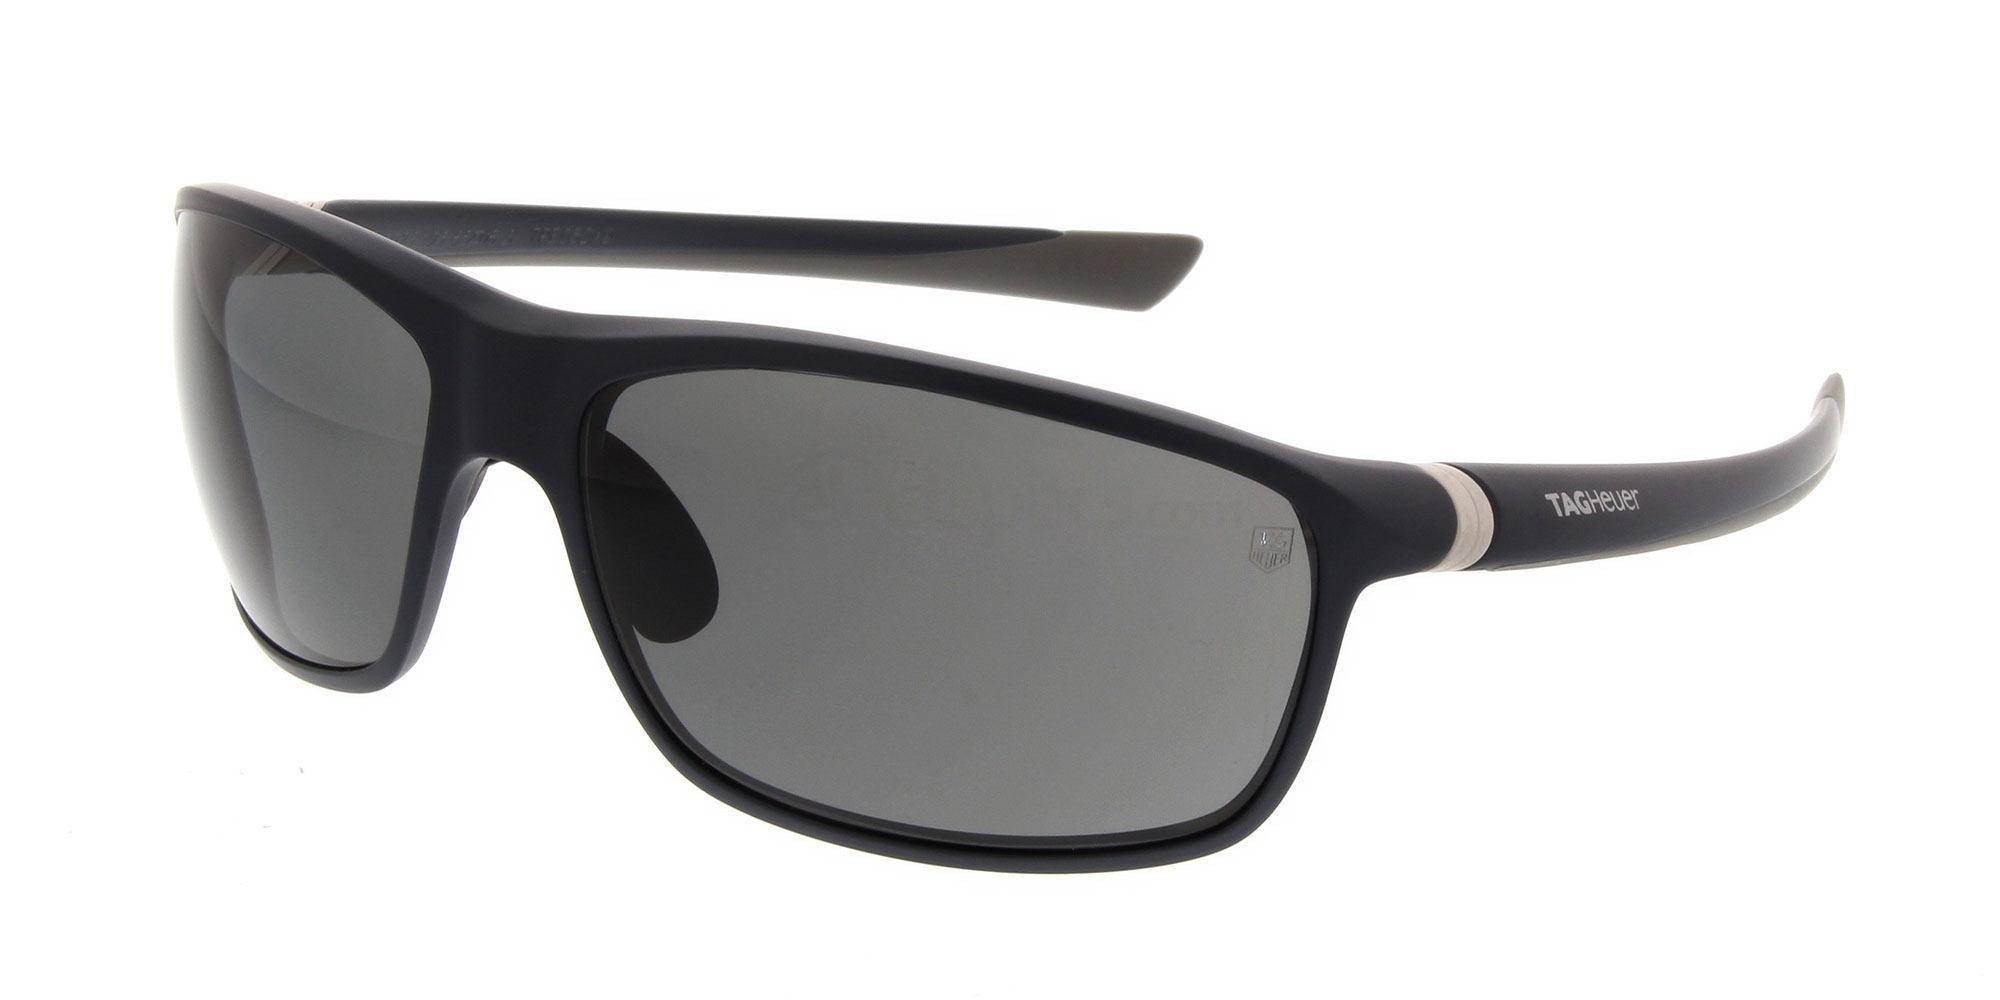 103 27° Sport 6023 Sunglasses, TAG Heuer